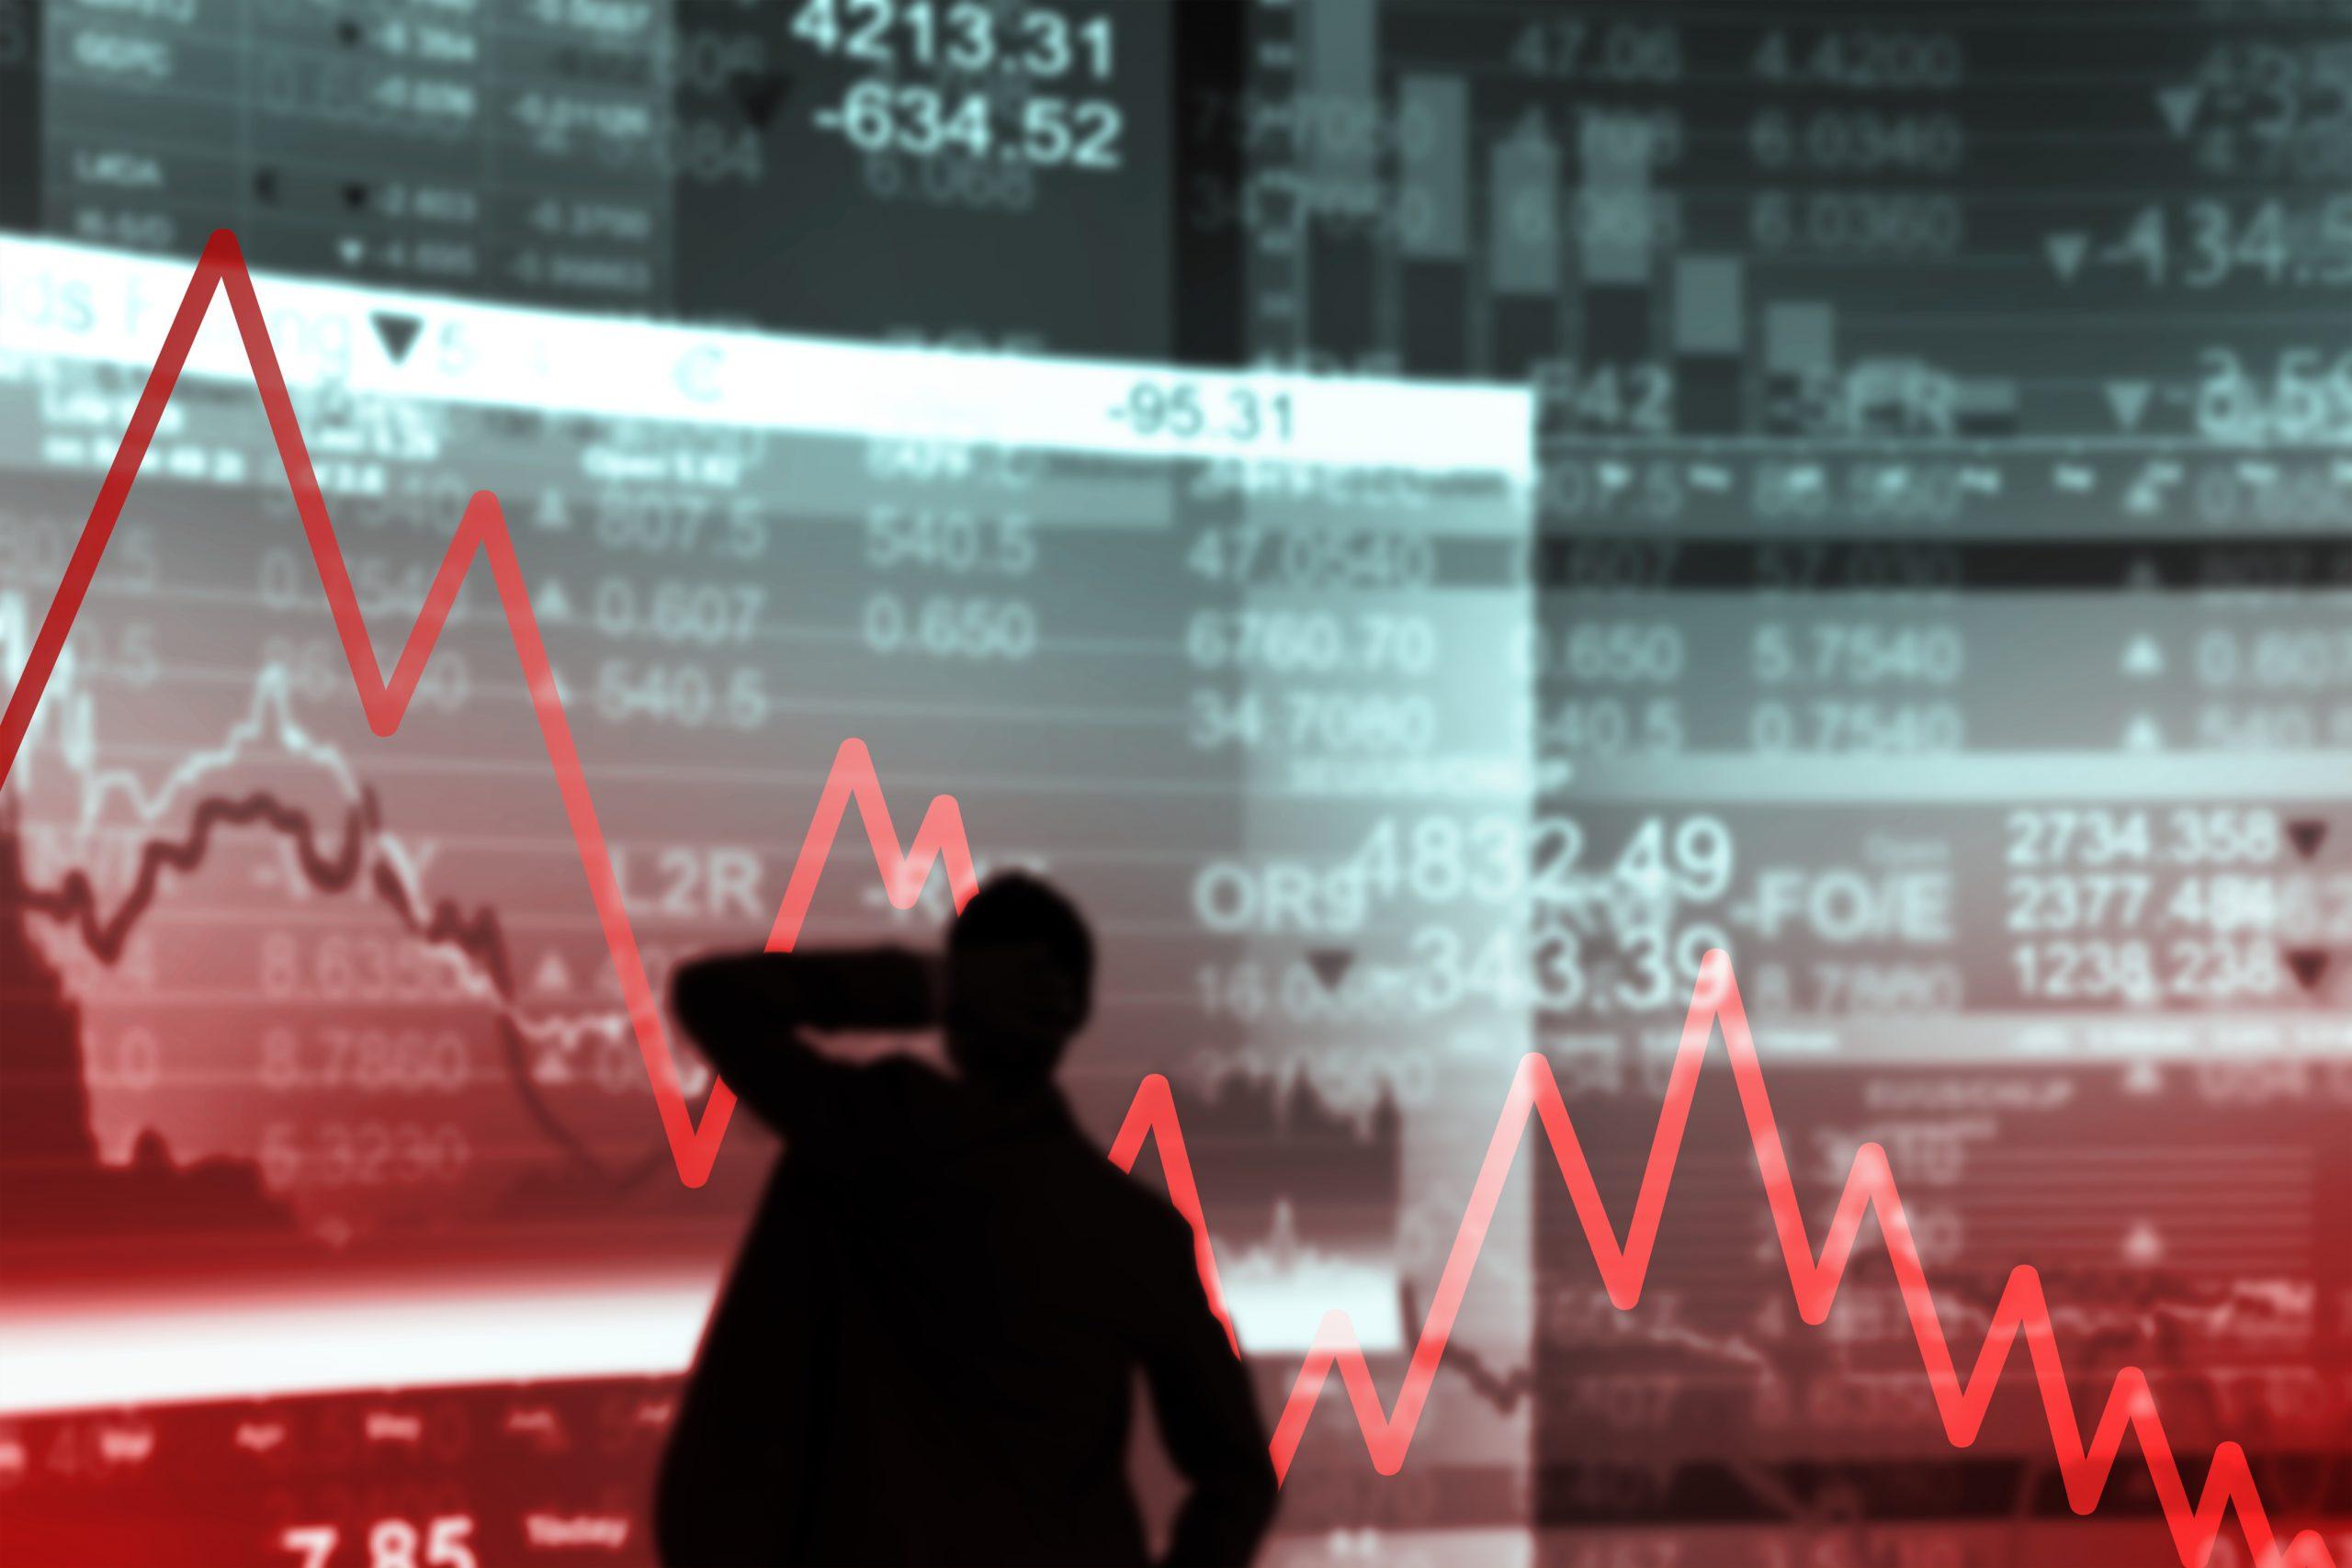 Beware Modern Monetary Theory's damaging potential